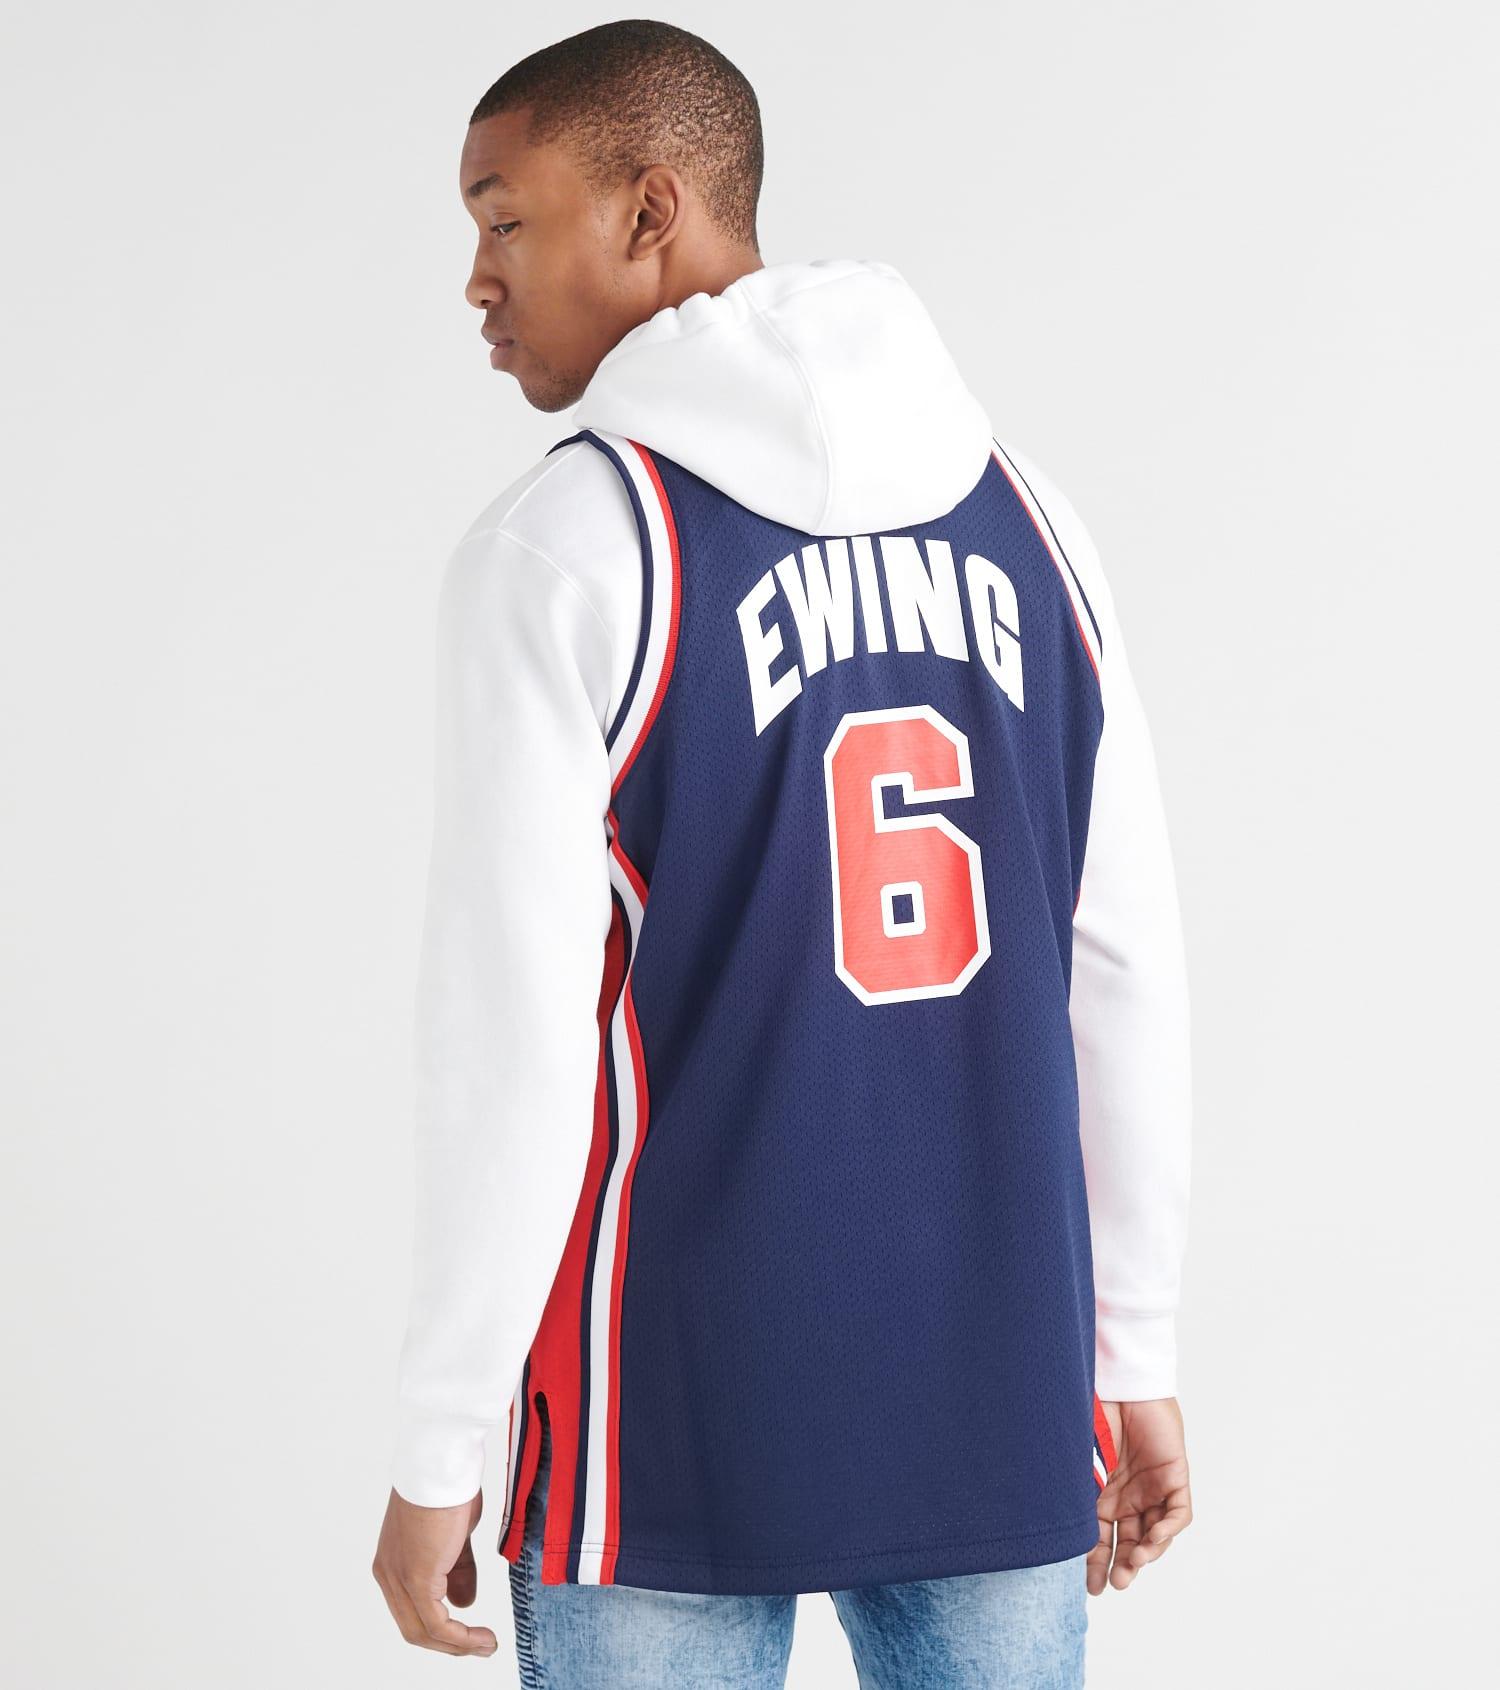 competitive price 12f31 e8715 Team USA Patrick Ewing Jersey